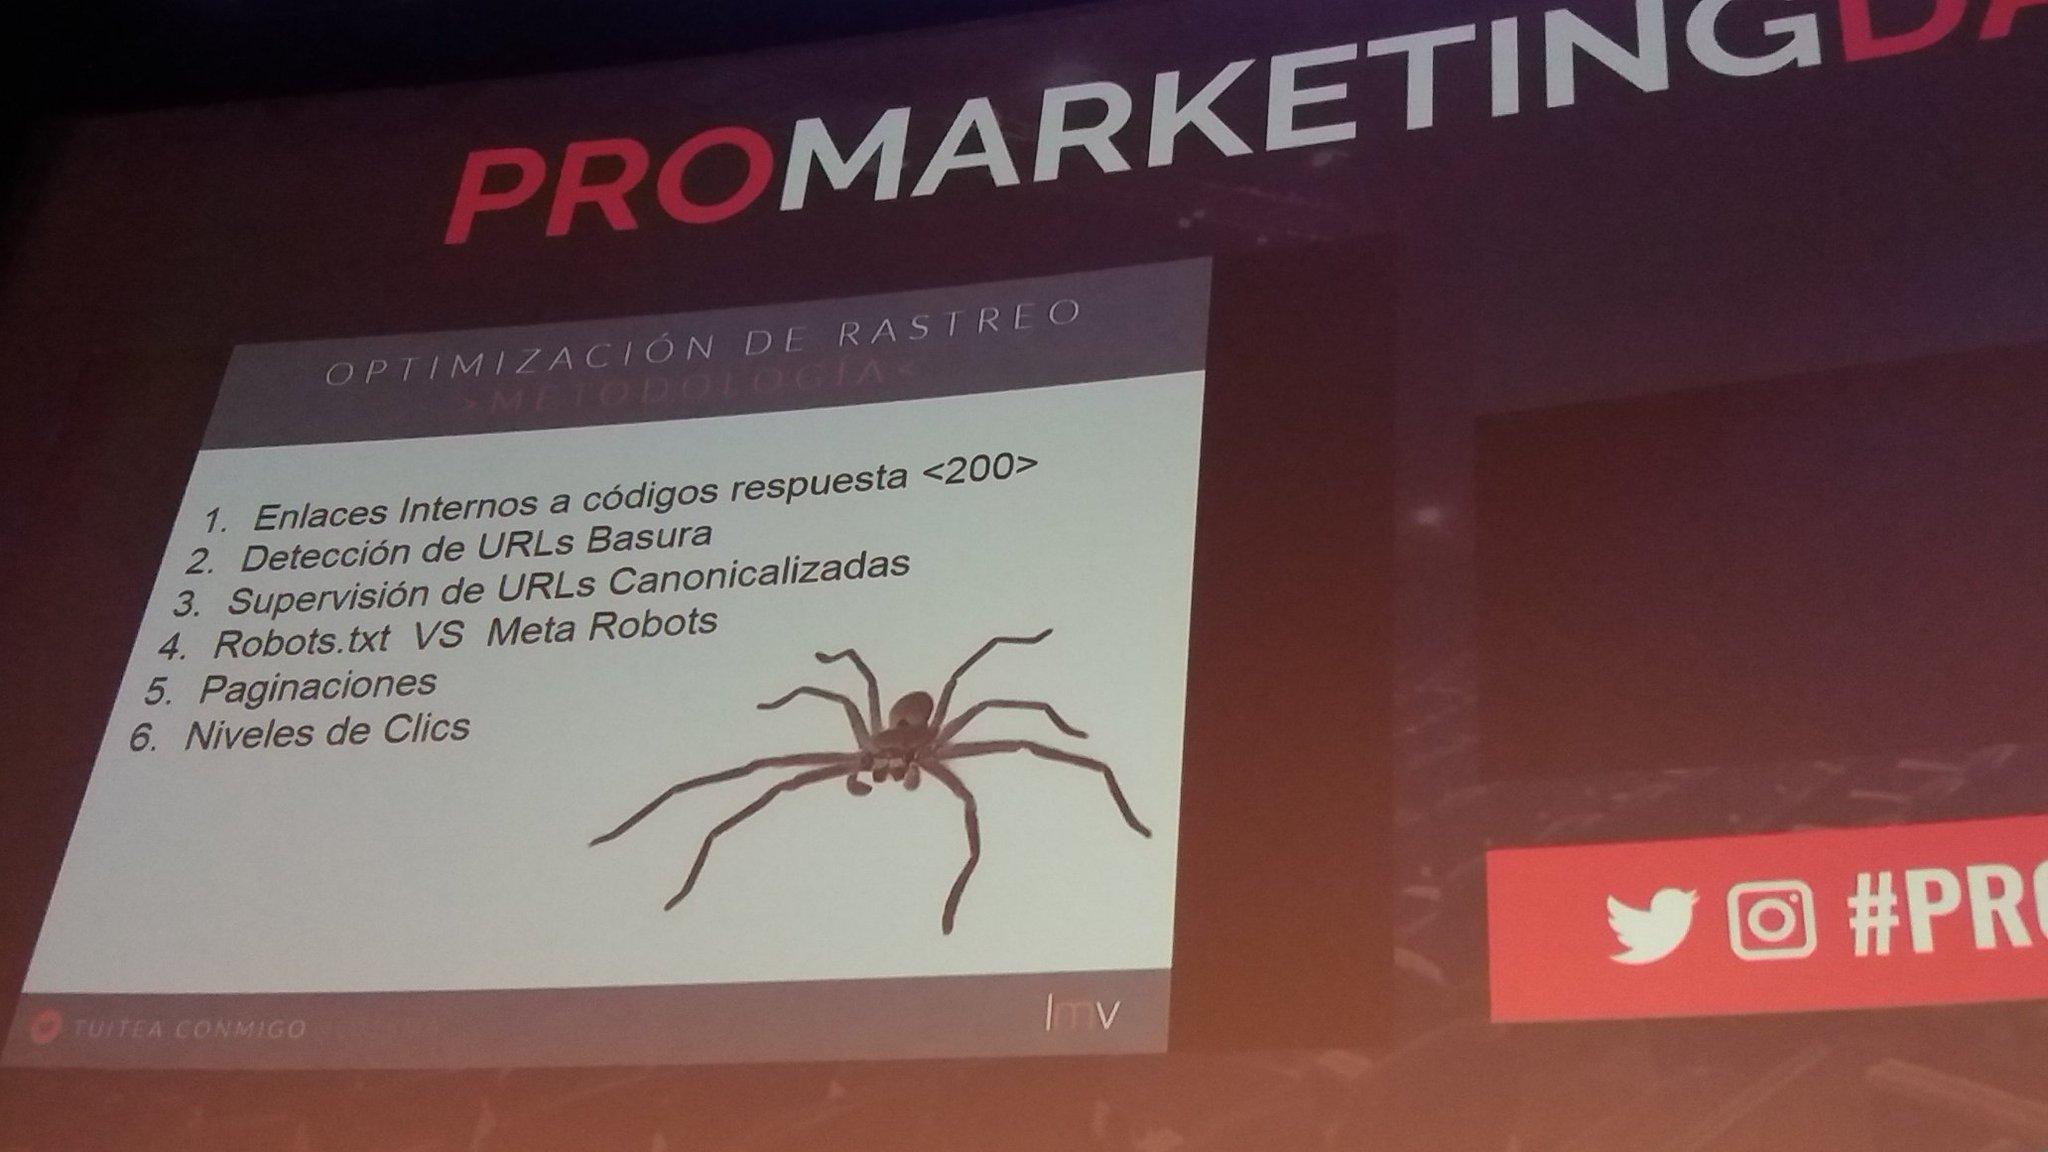 @Lu1sma Metodología para optimización del rastreo 🐜 #ProMarketingDay https://t.co/VafCrwck0P